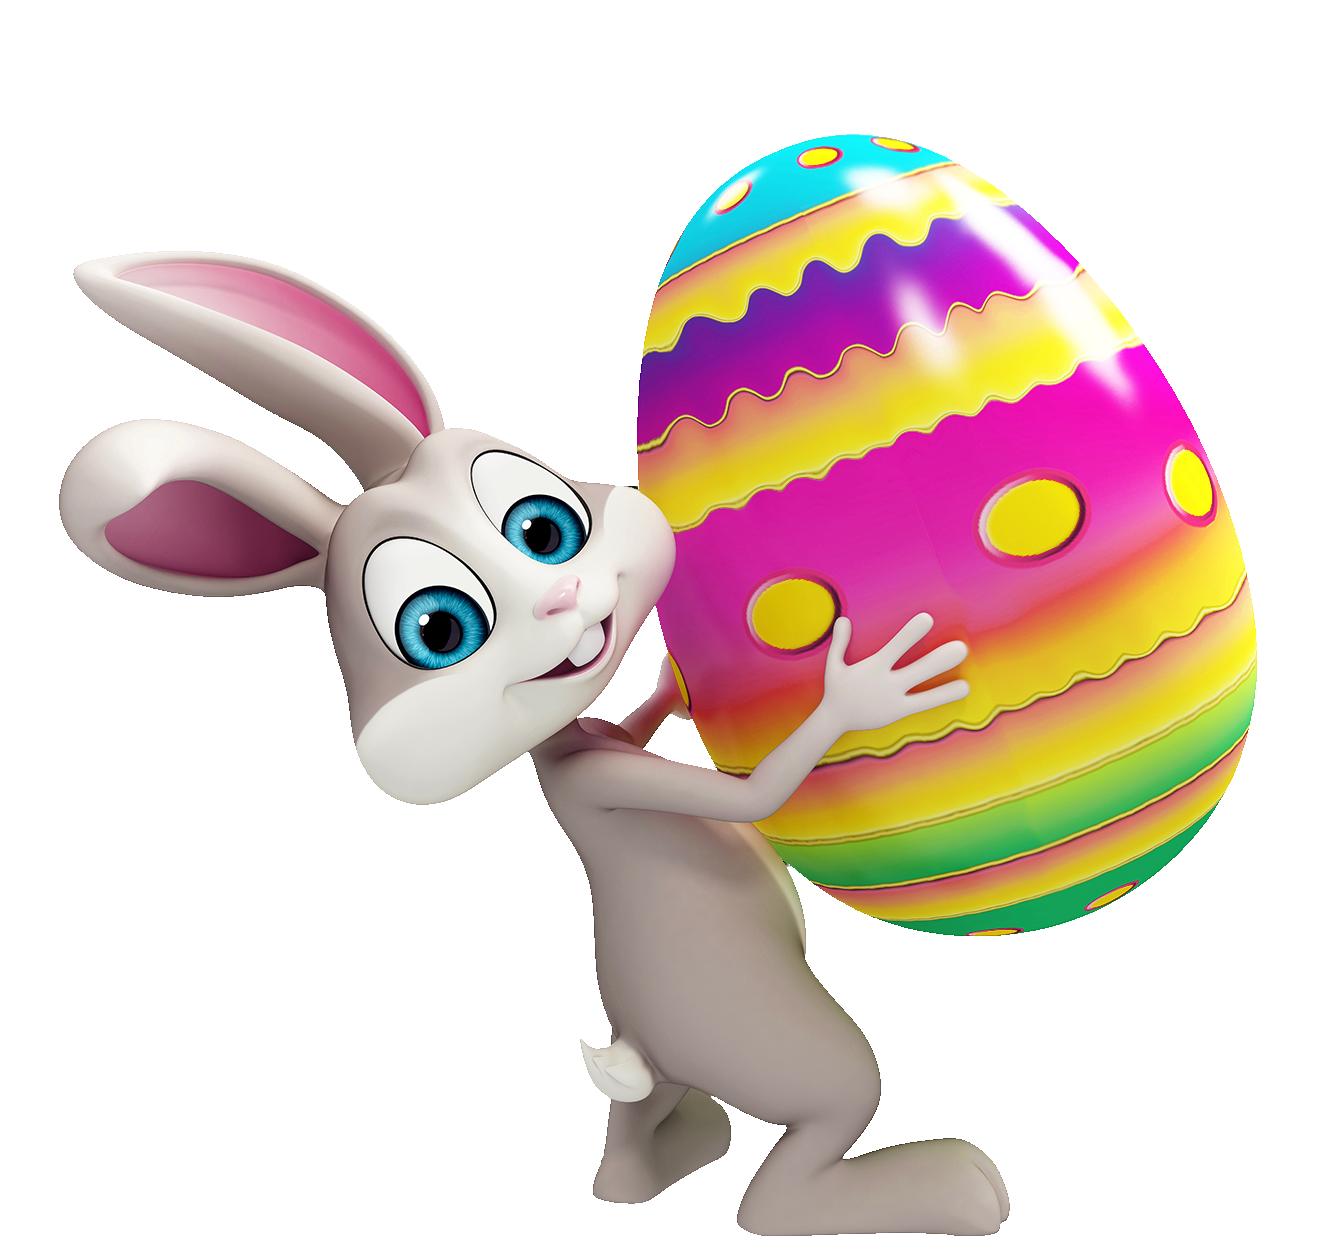 Convalescent clipart graphic royalty free download Easter Party!! | Nursing Home Sligo, Retirement Care, Respite Care ... graphic royalty free download